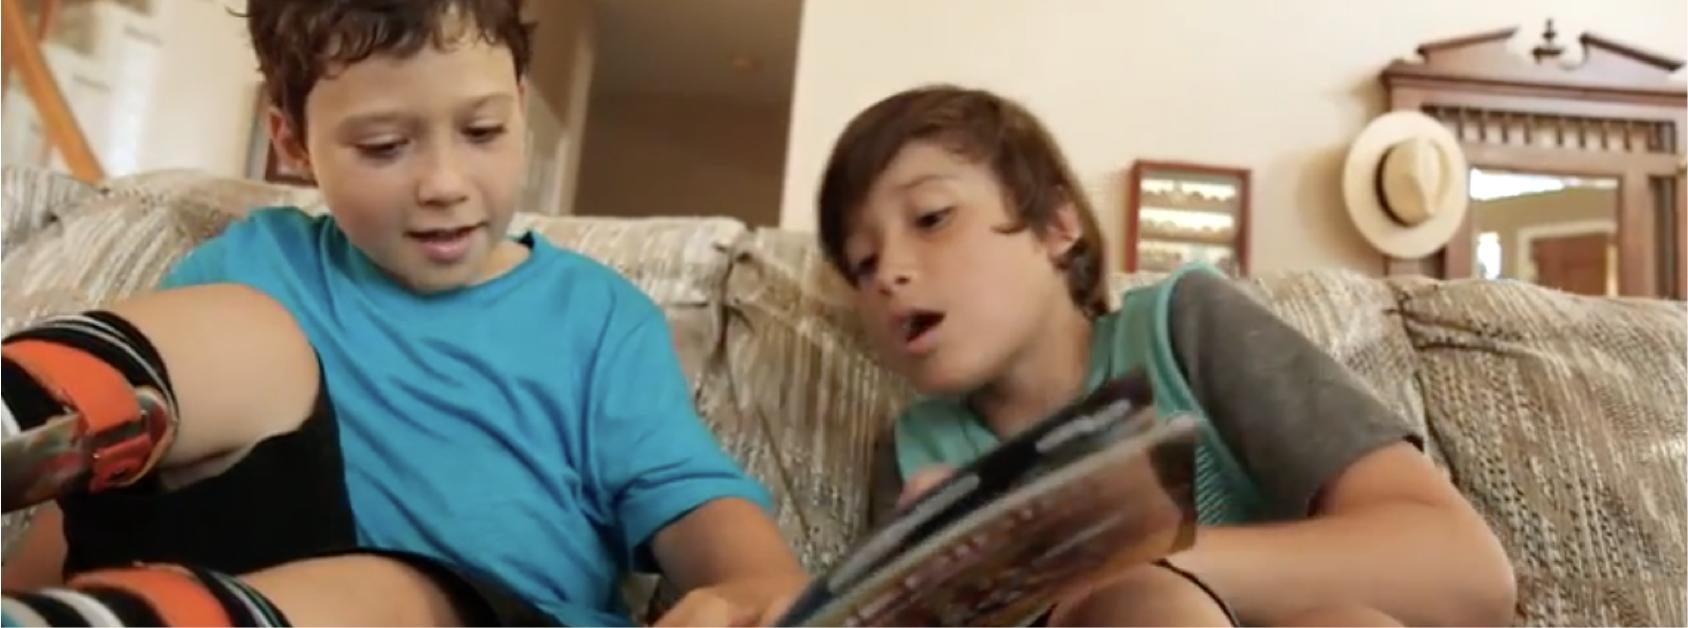 two kids reading comics